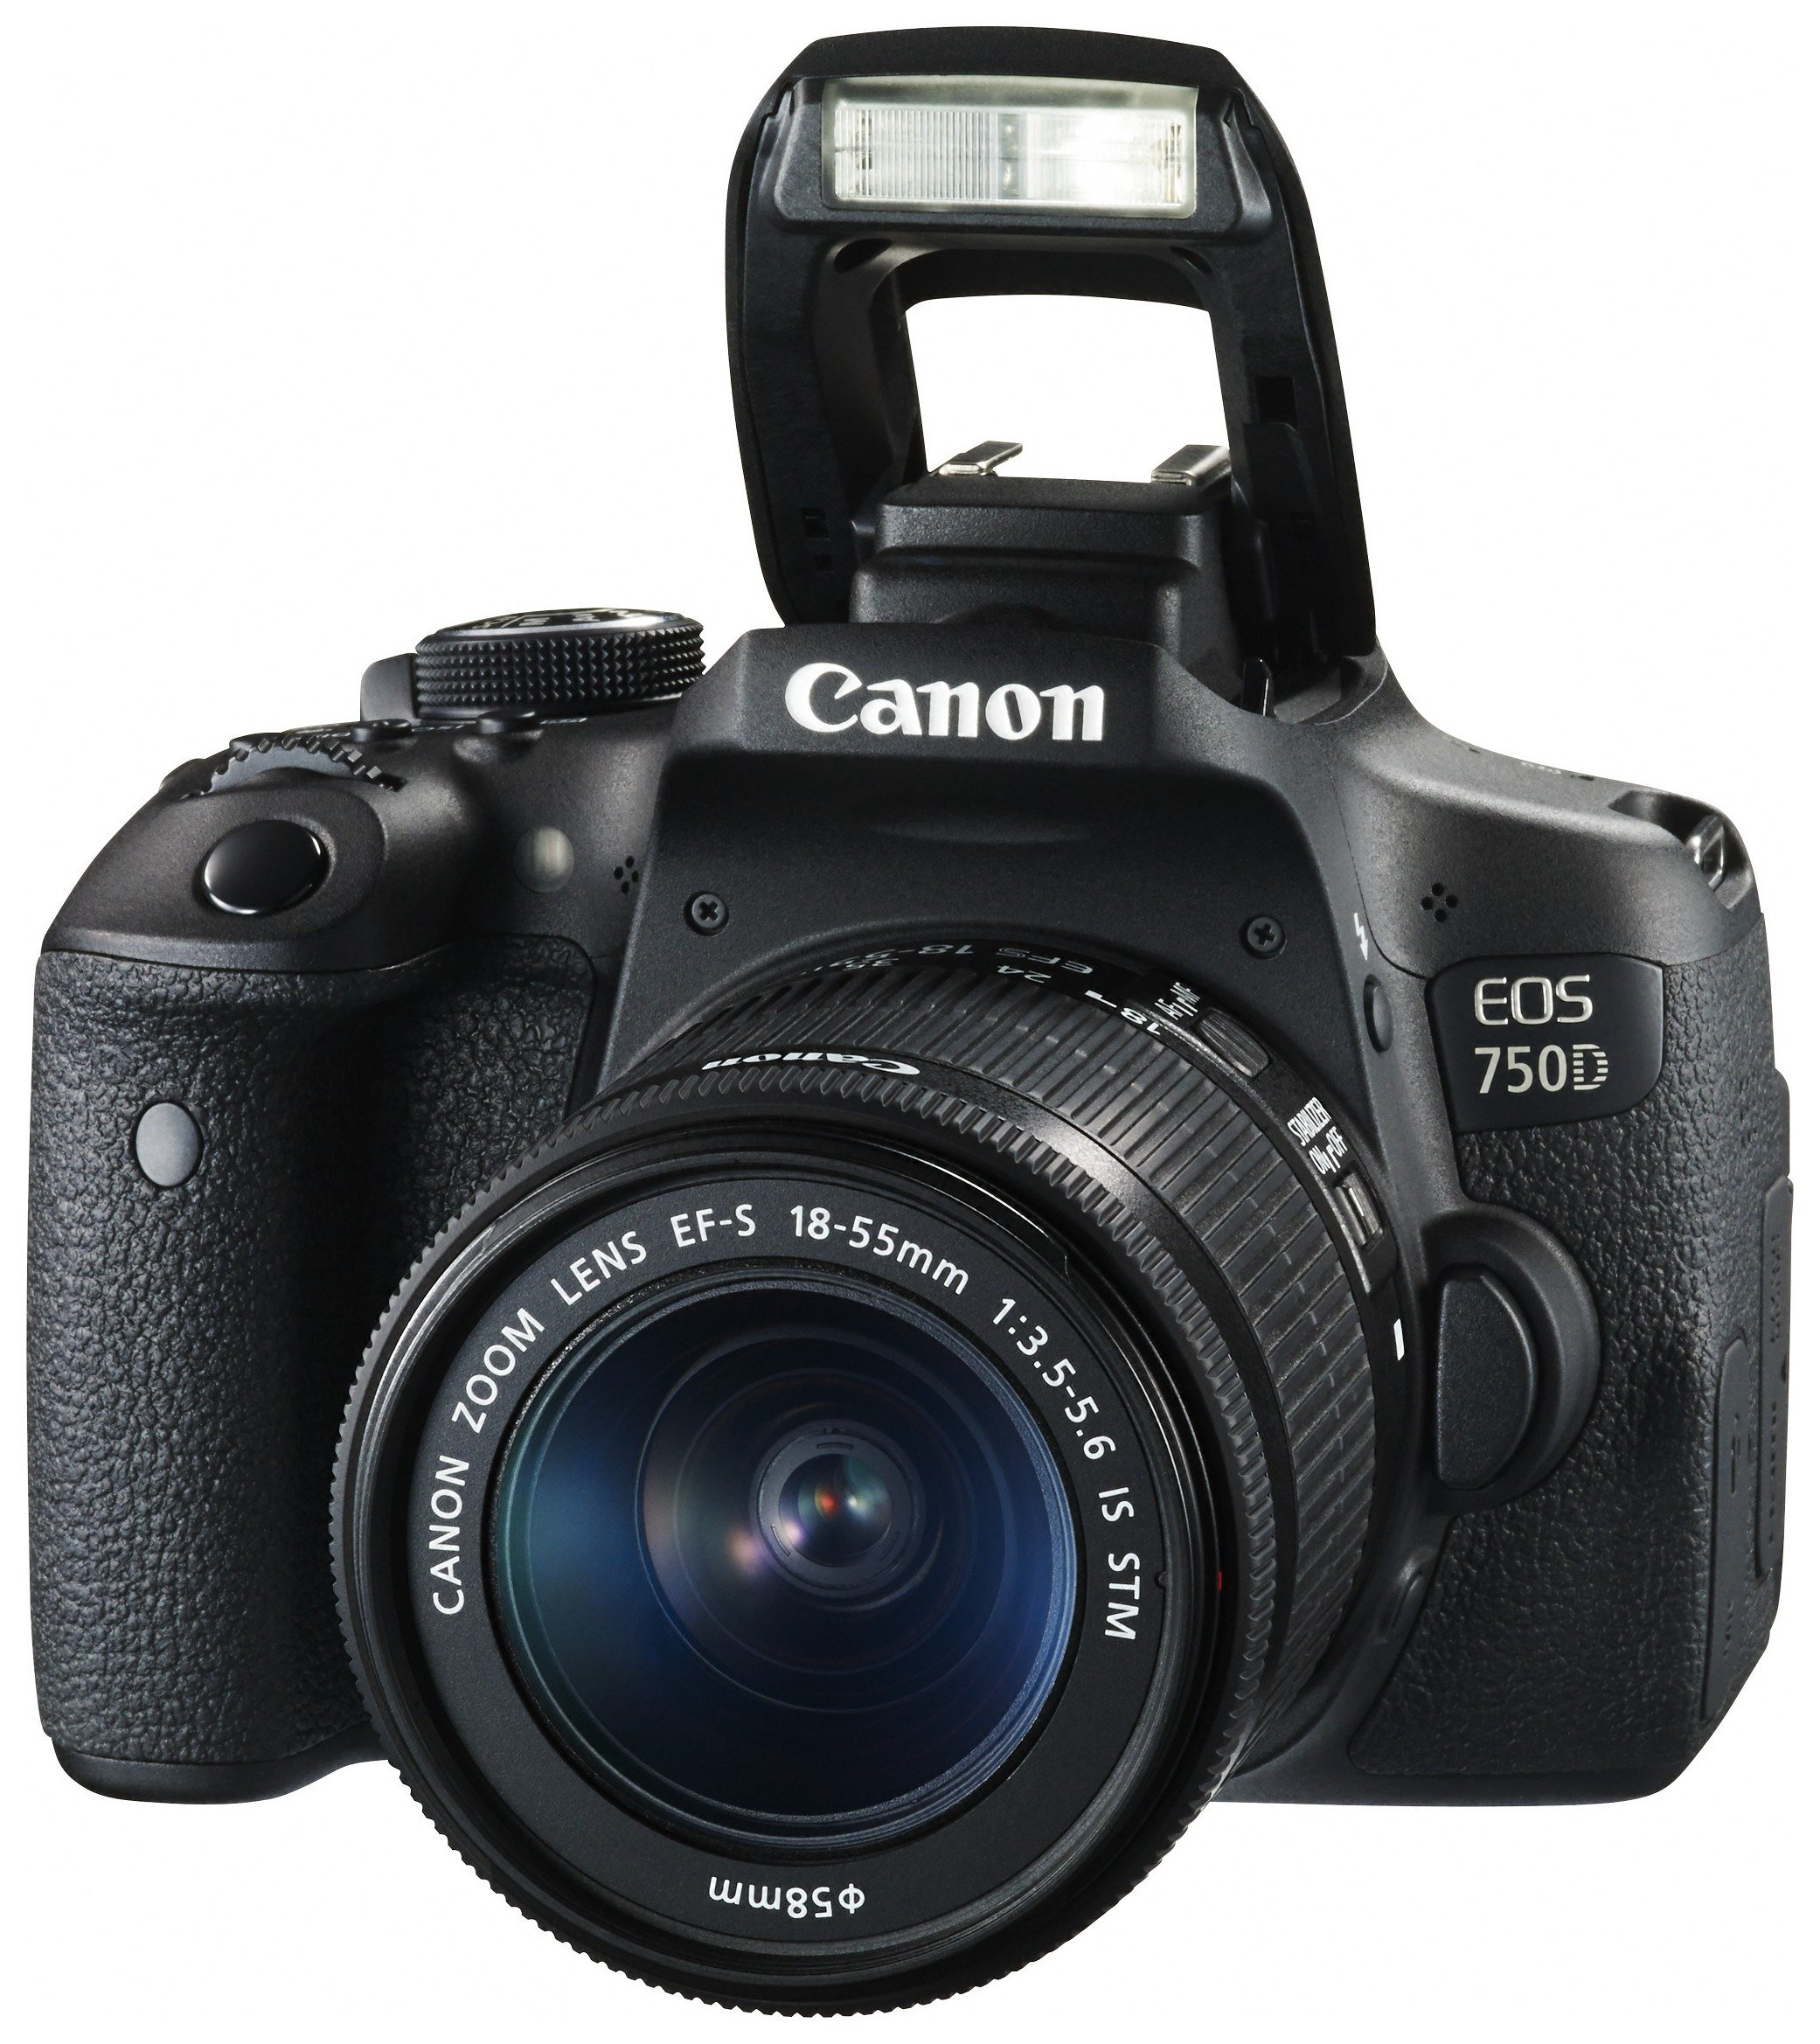 Camera Argos Dslr Cameras buy canon eos 750d dslr camera with 18 55mm lens at argos co uk lens4256733